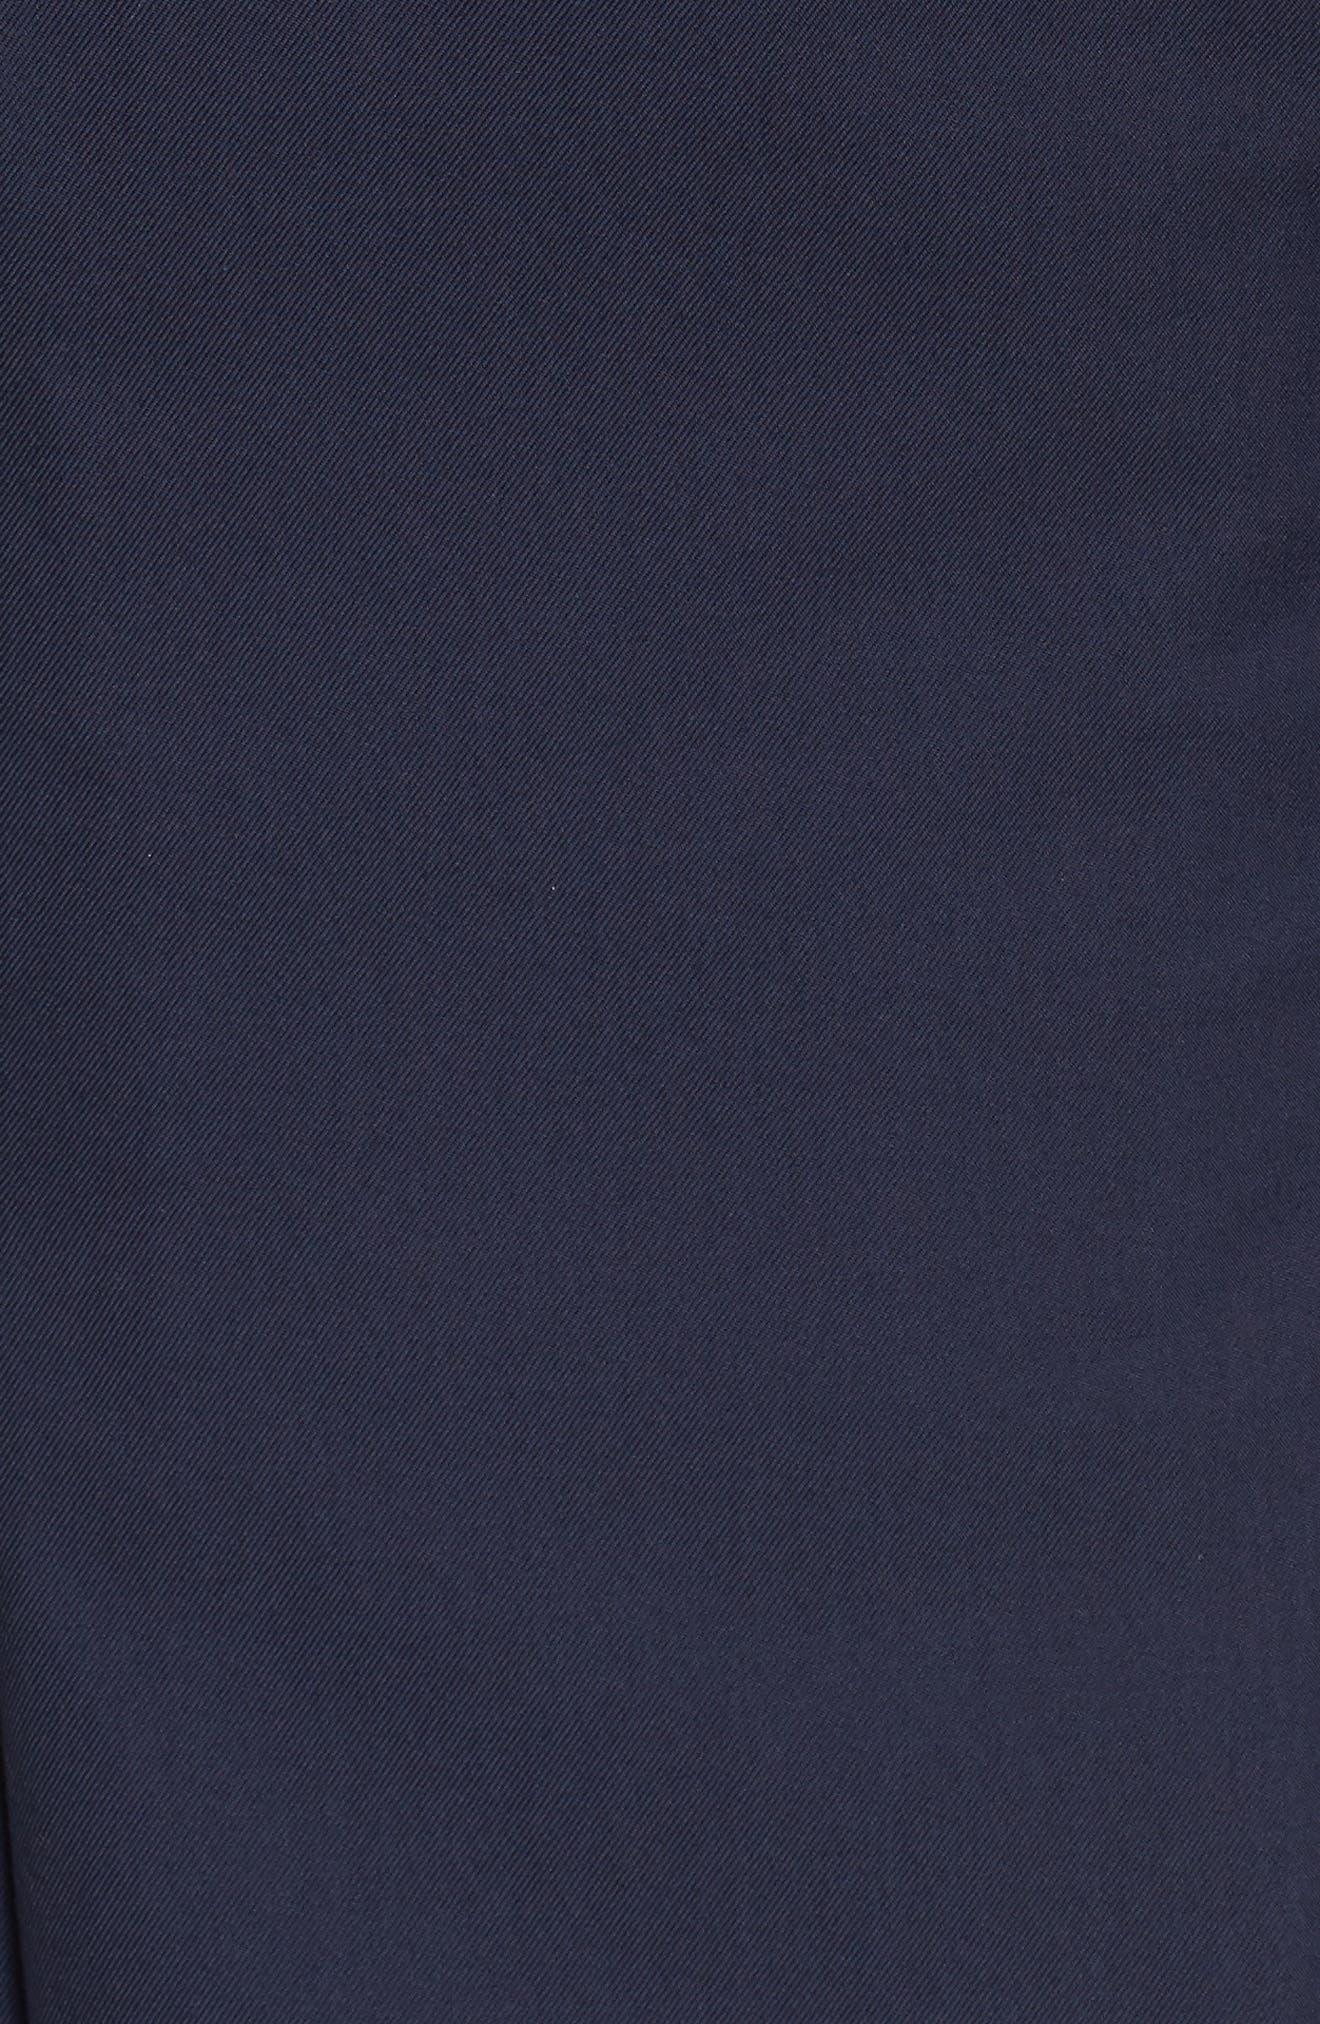 Blouson Sleeve A-Line Twill Dress,                             Alternate thumbnail 9, color,